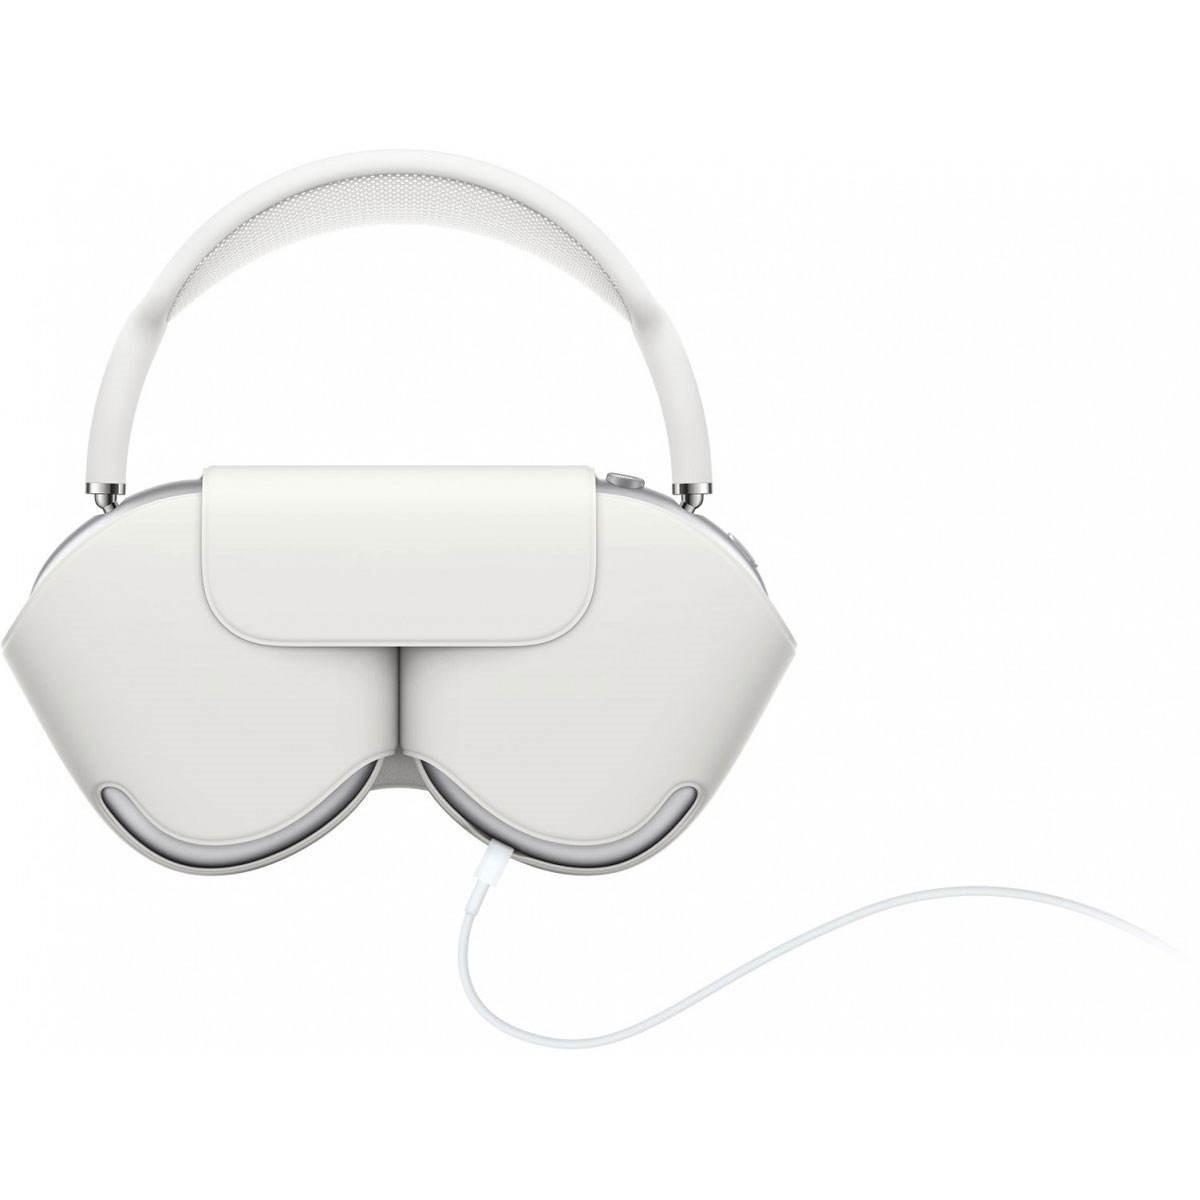 هدفون بلوتوثی اپل مدل AirPods Max